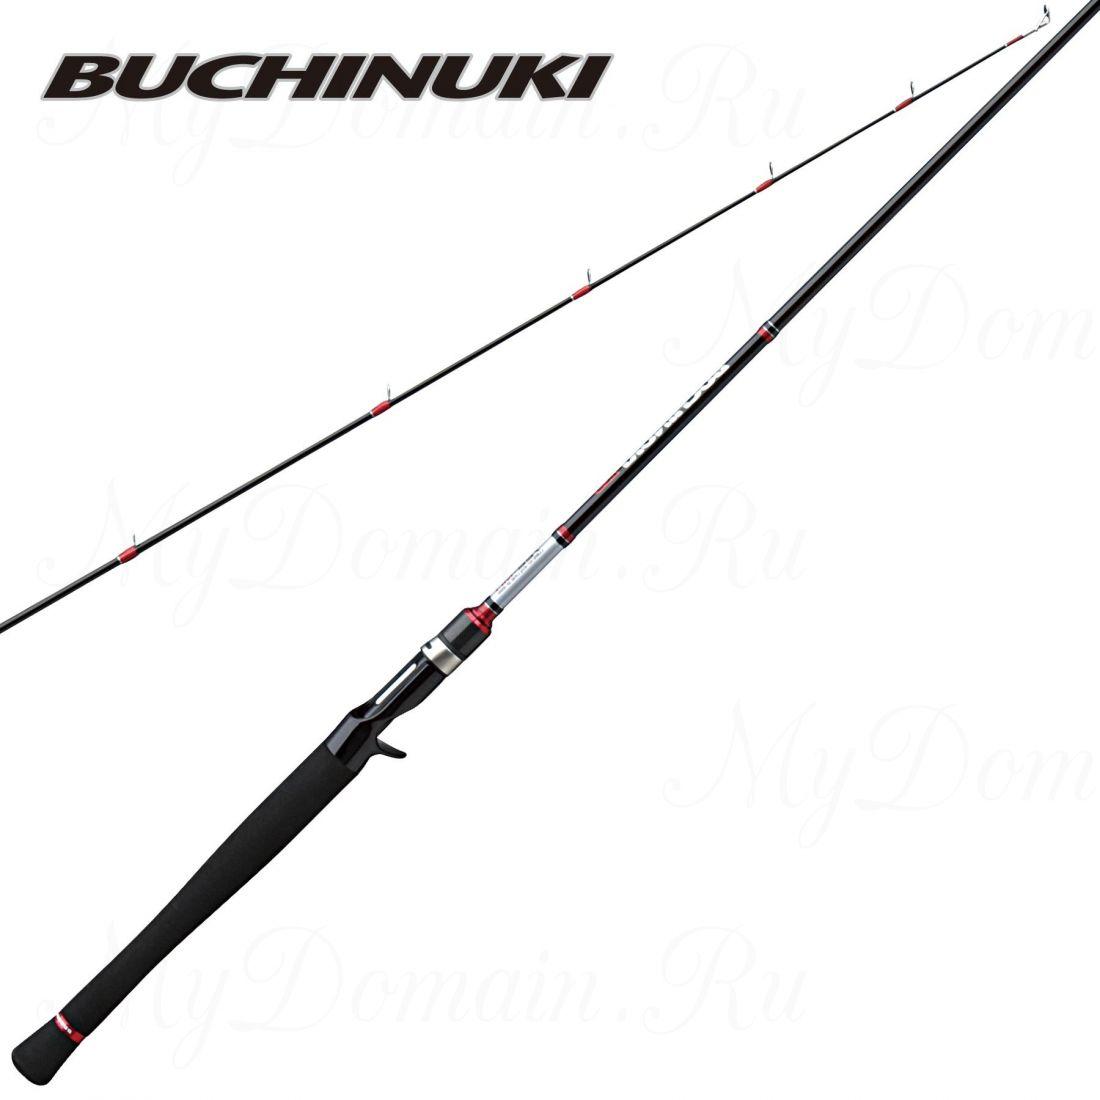 Удилище кастинговое Prox Buchinuki BC-2-722MH 220 cм, 2 секции, 10-40 гр, вес 142 гр, транспортная длина 114 см.